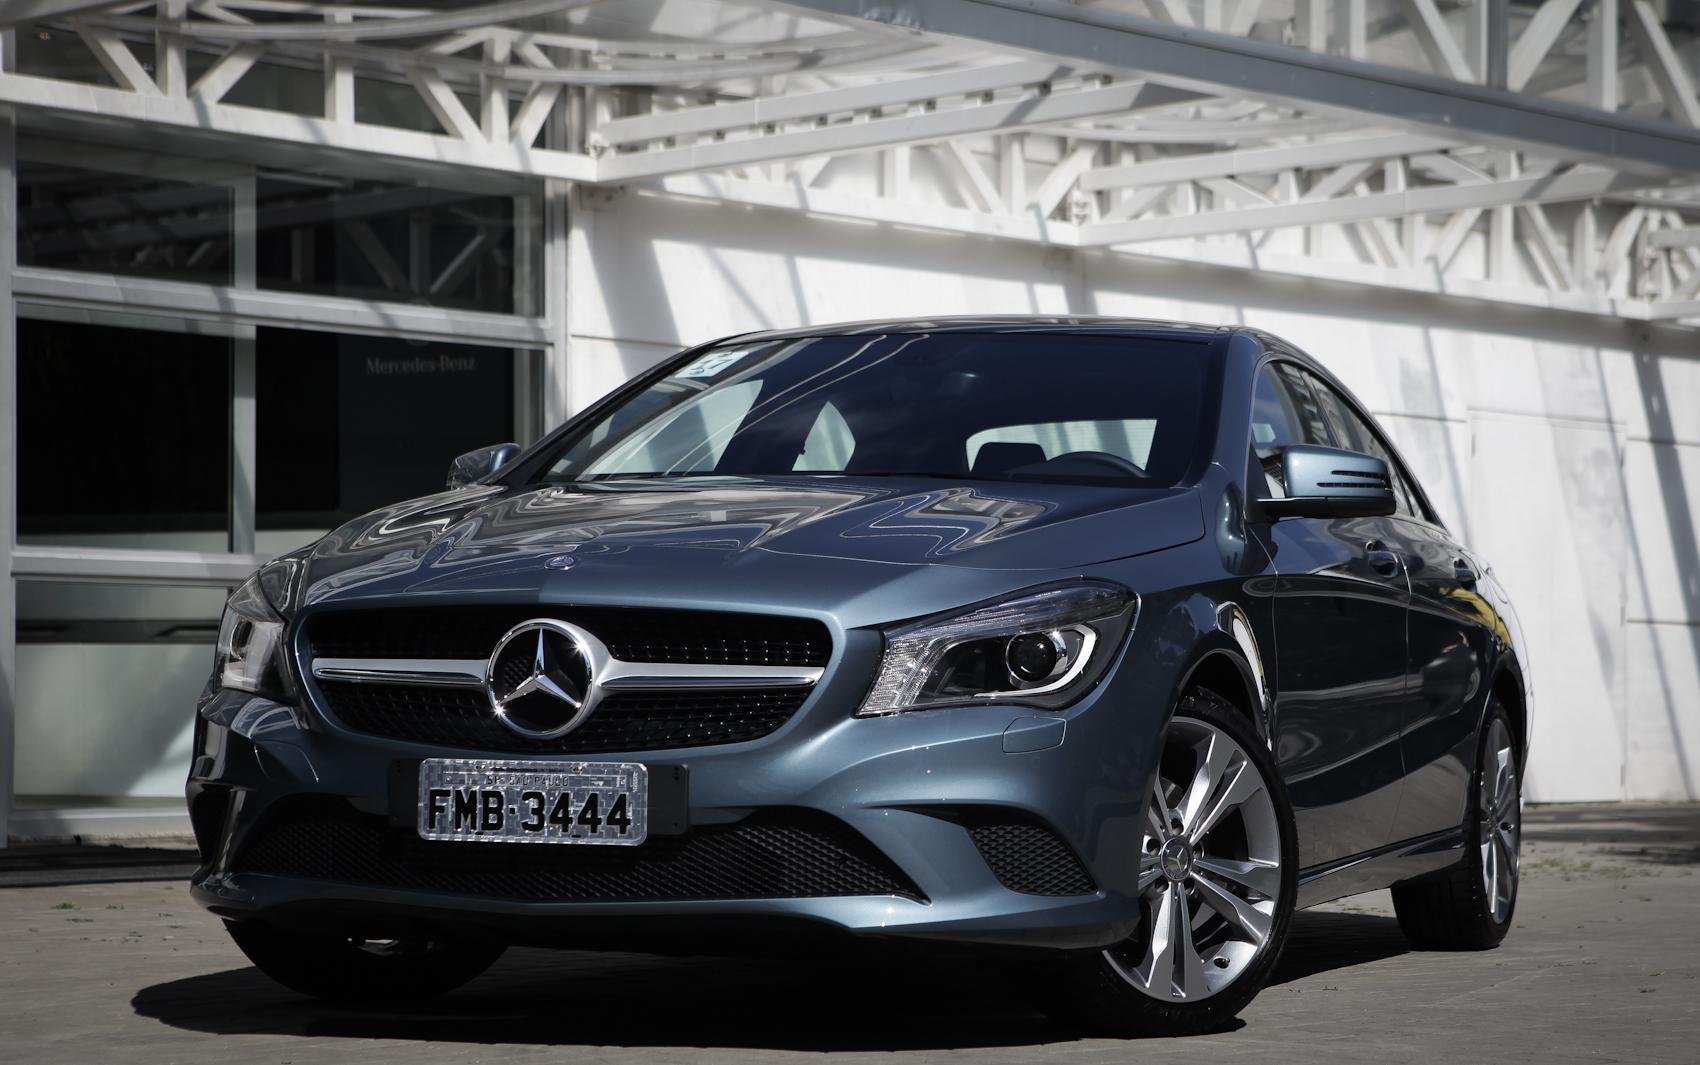 Veja fotos de audi a3 sedan e mercedes benz cla fotos em for Mercedes benz modelos